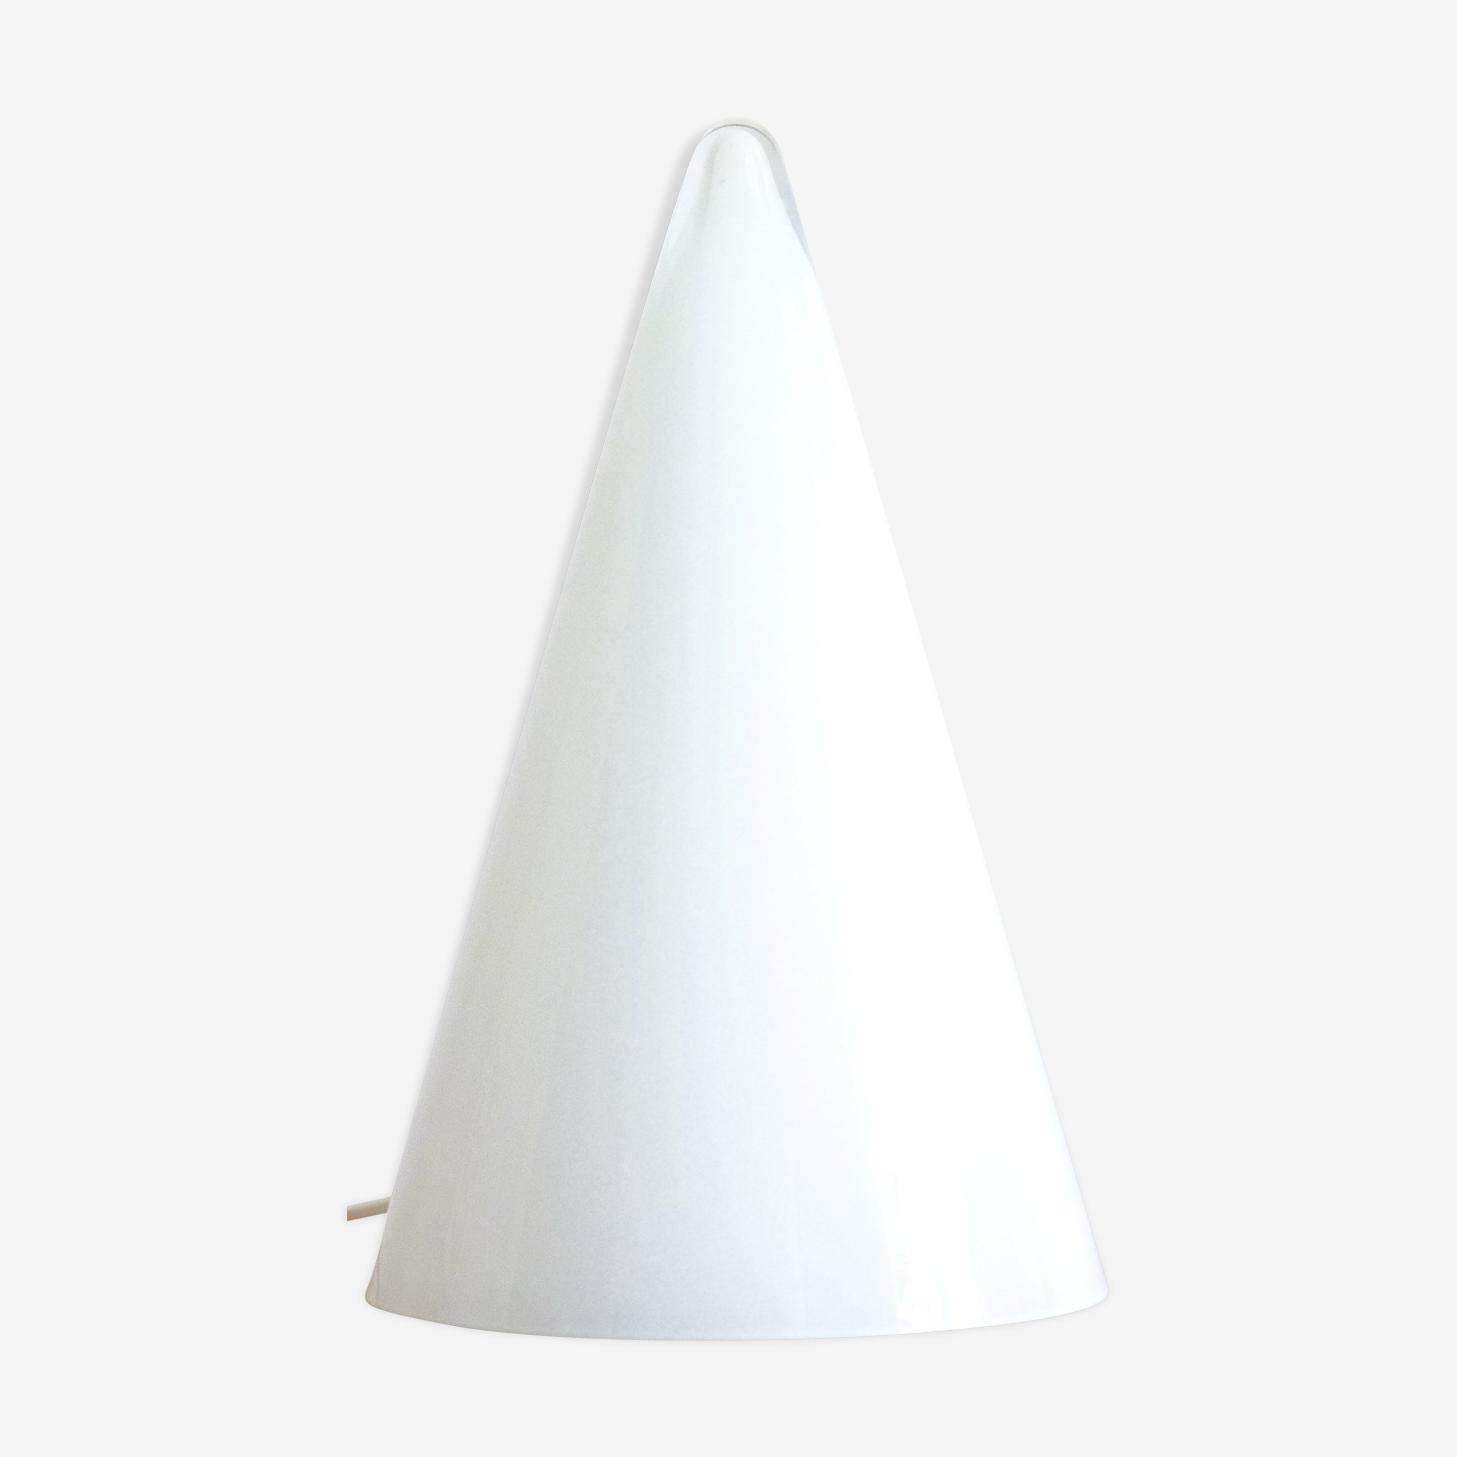 Lampe conique en verre opaque, SCE Made in France, années 80